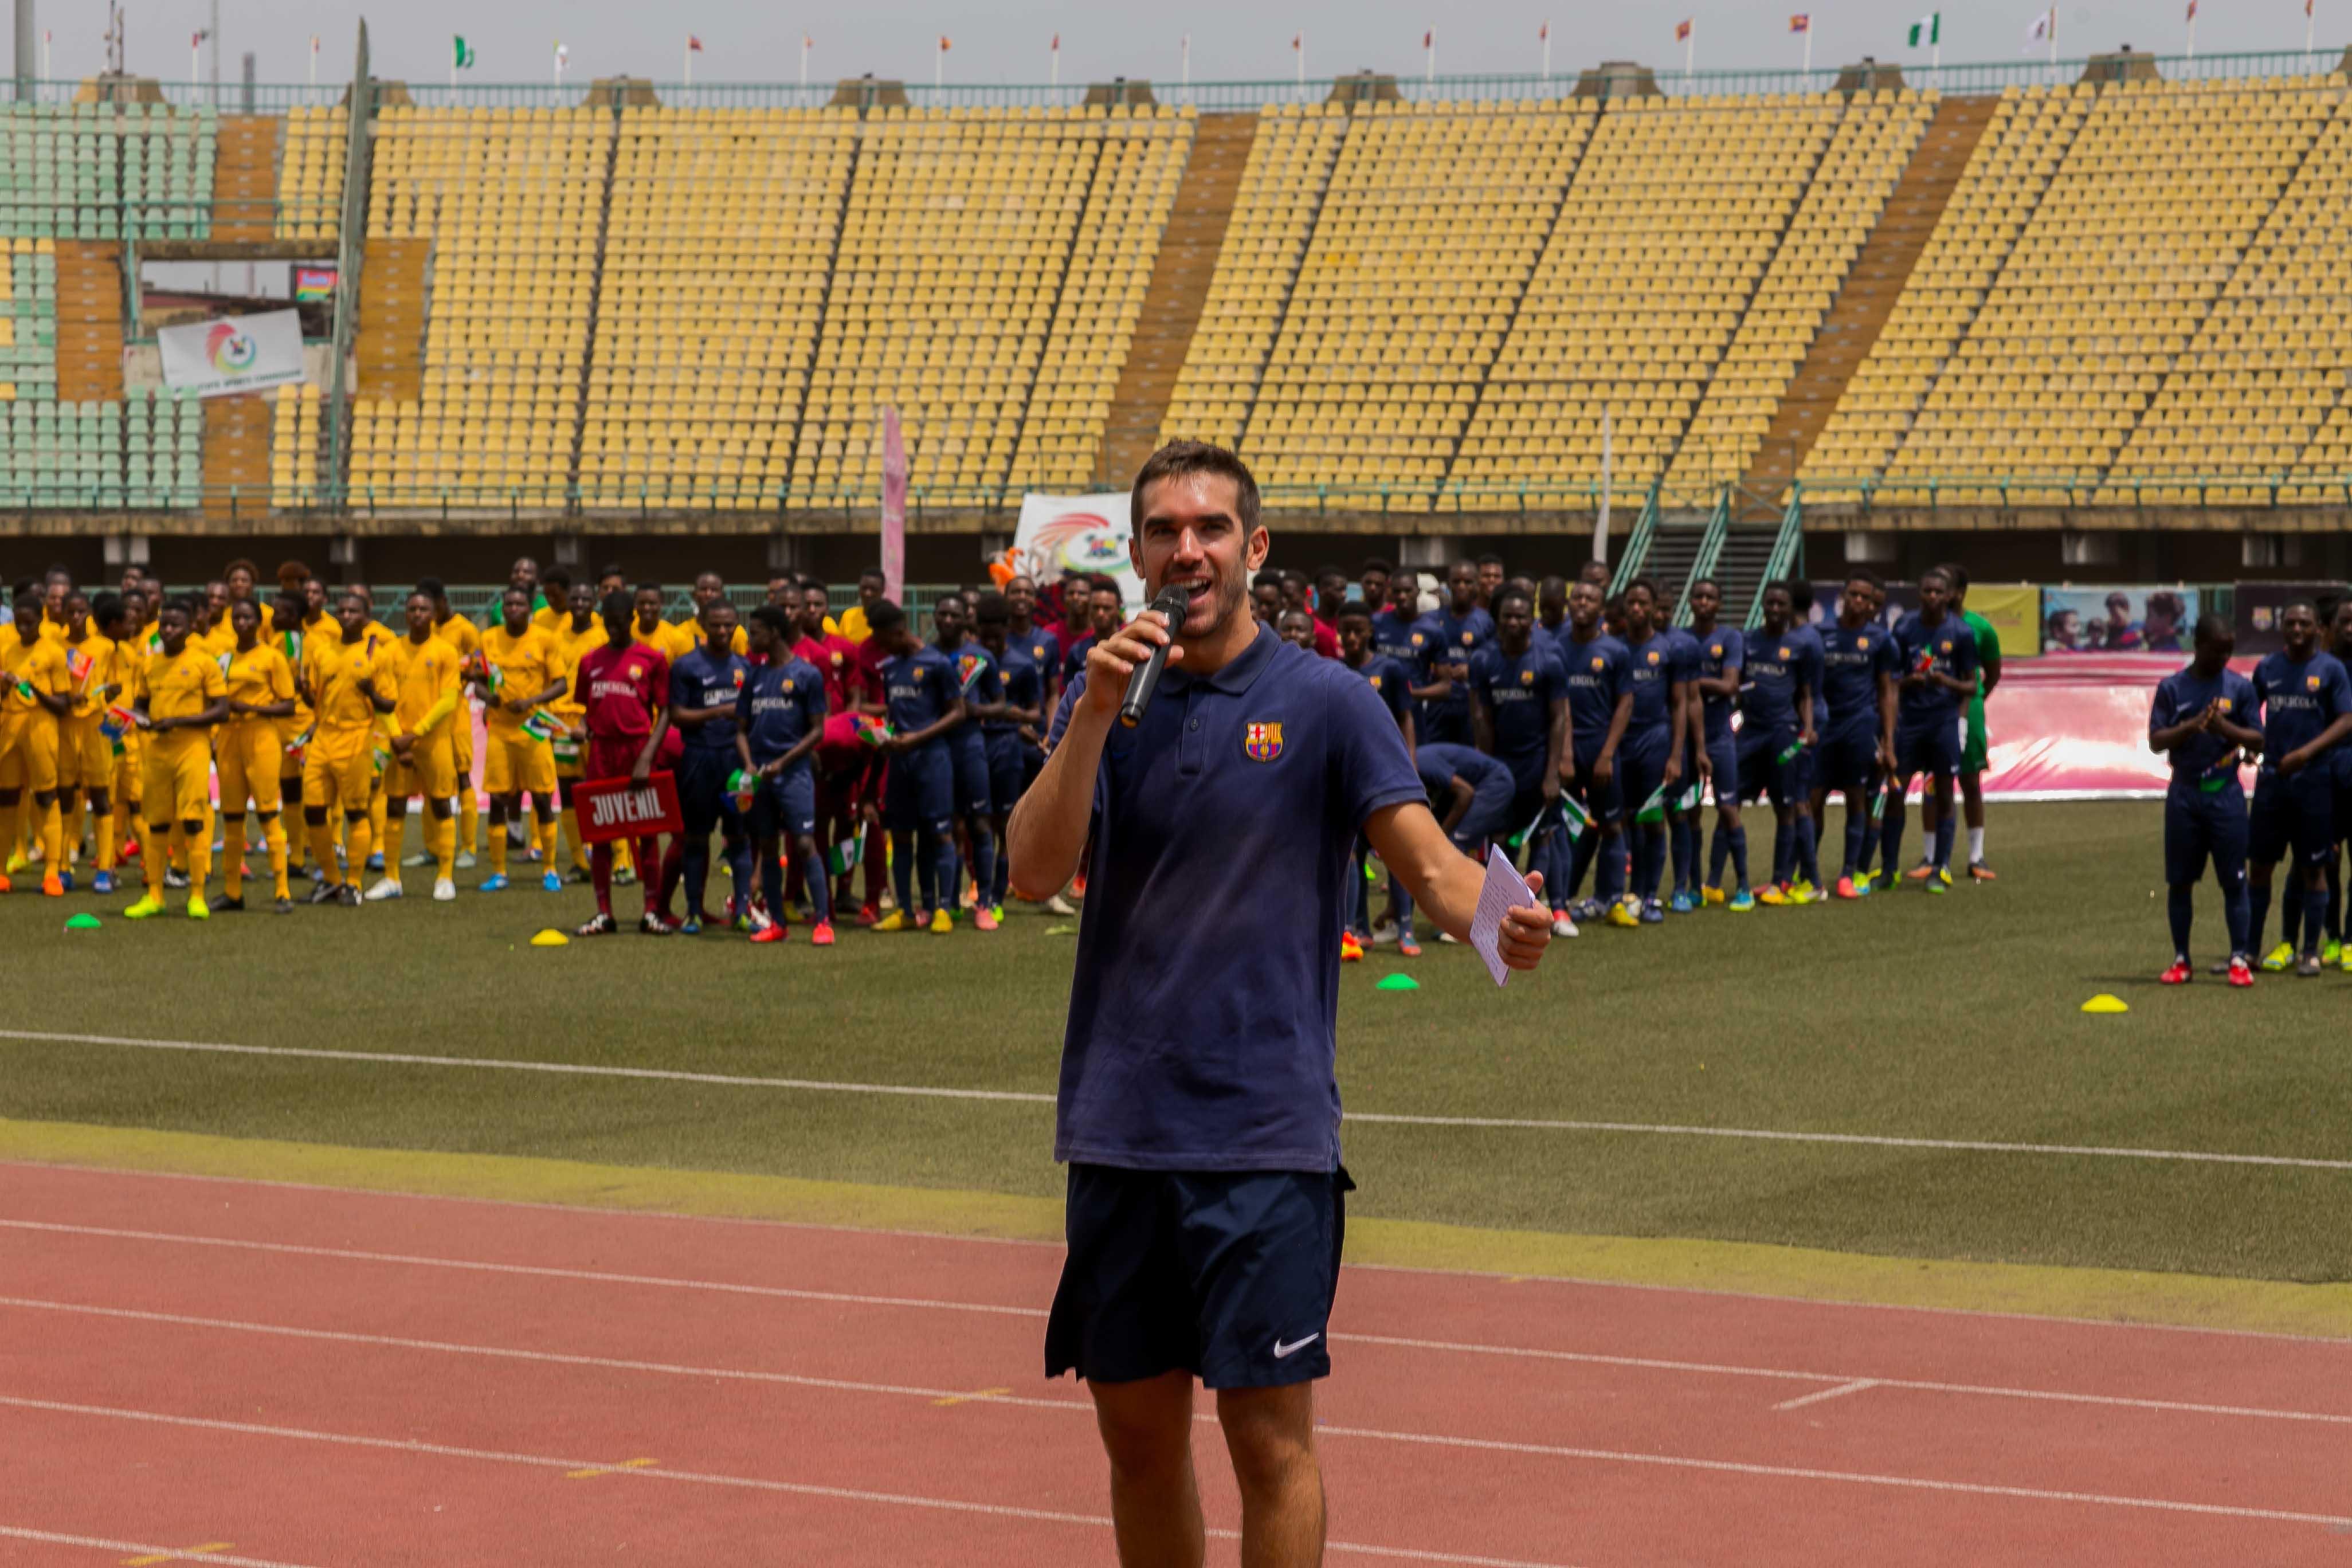 BARÇA ACADEMY; GROOMING FUTURE FOOTBALL STARS FROM NIGERIA - Brand Spur